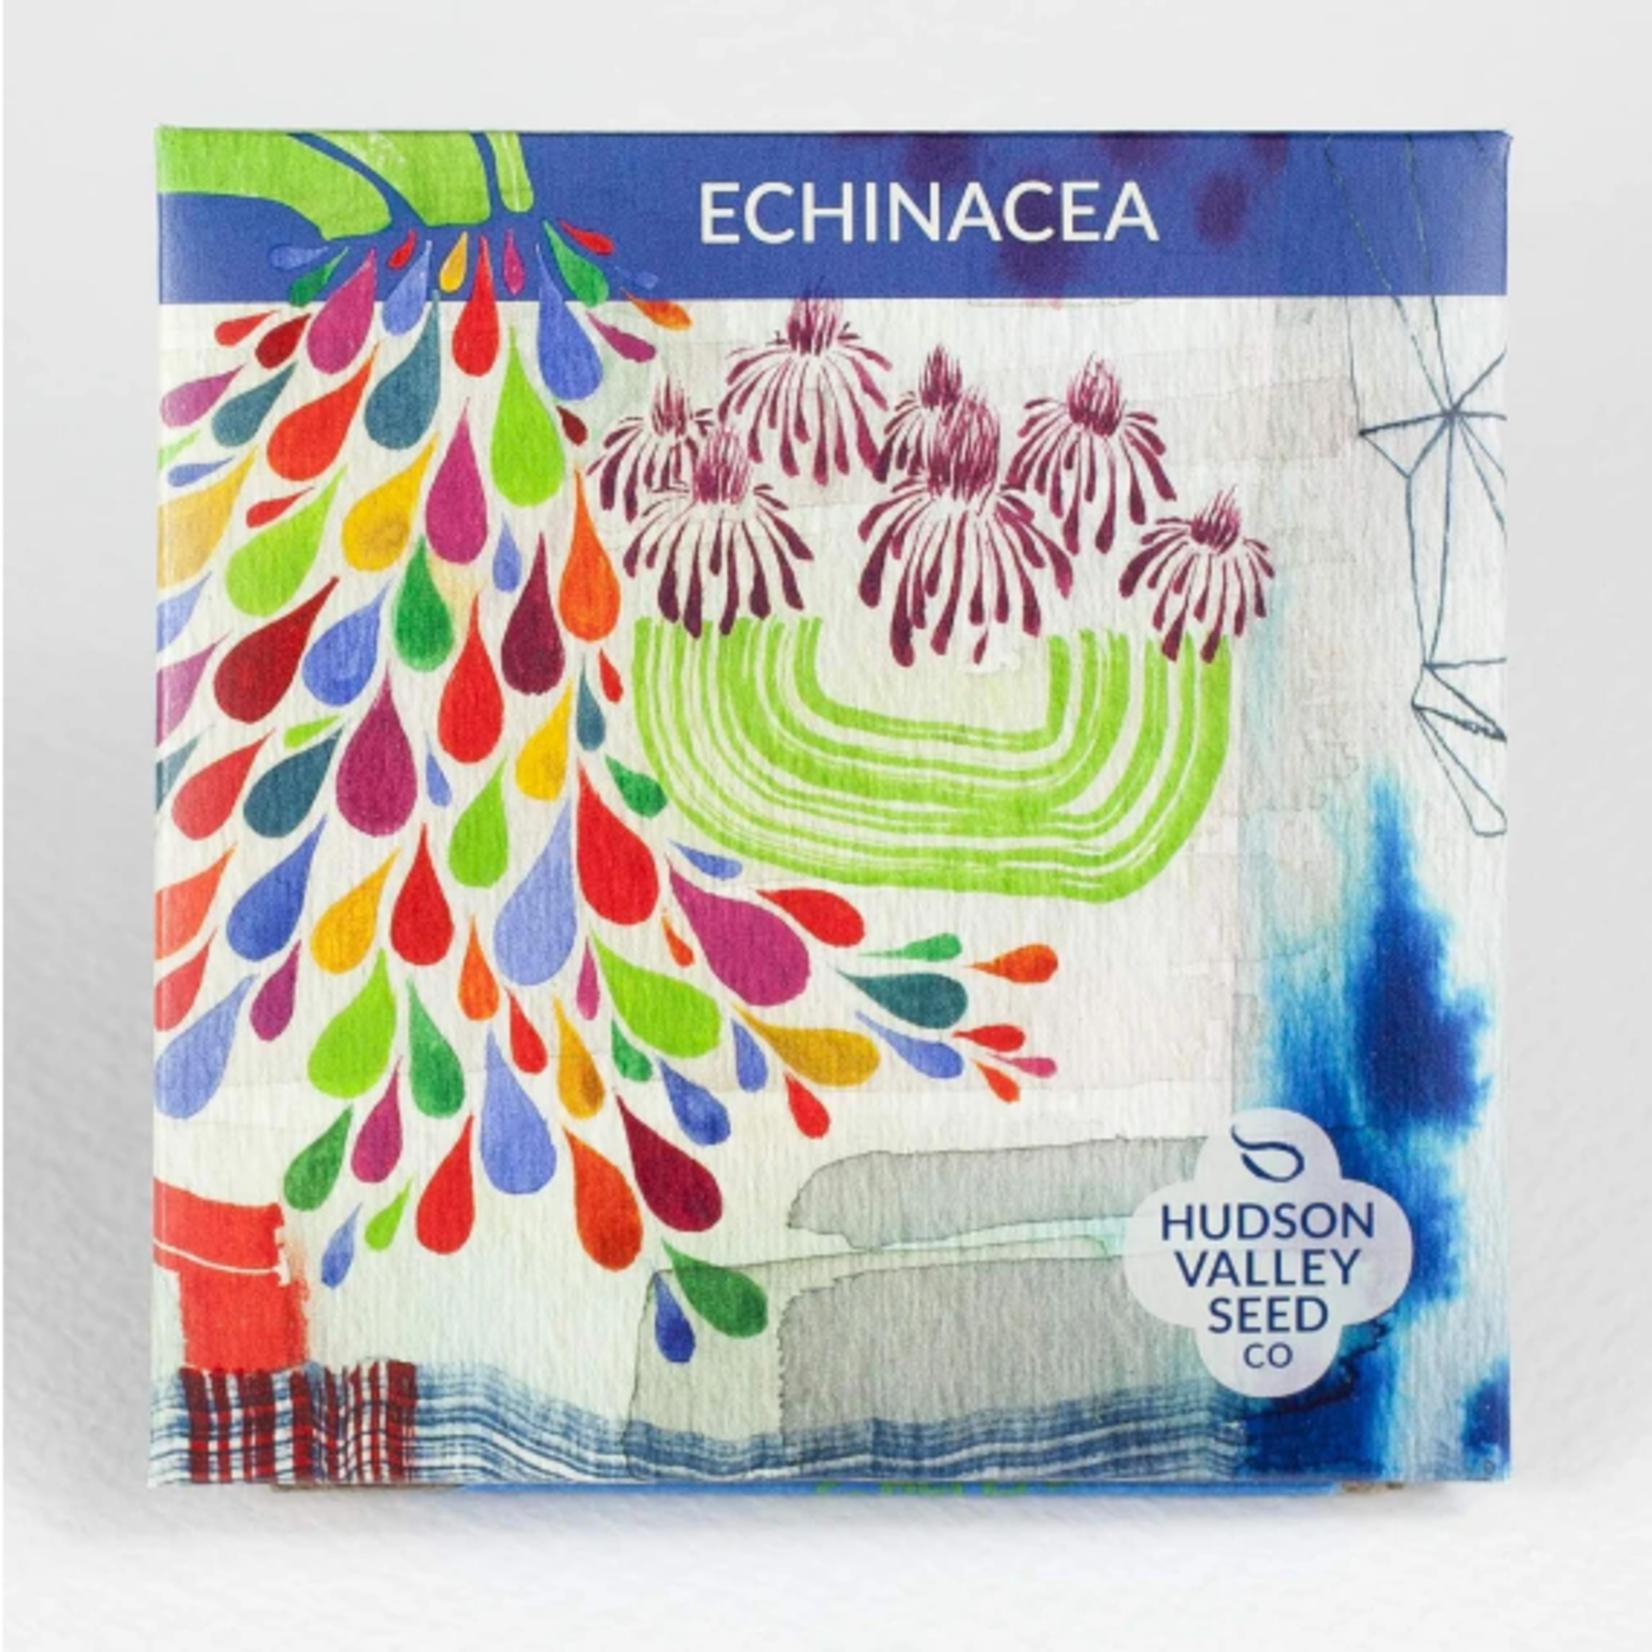 Hudson Valley Seeds Echinacea Seeds